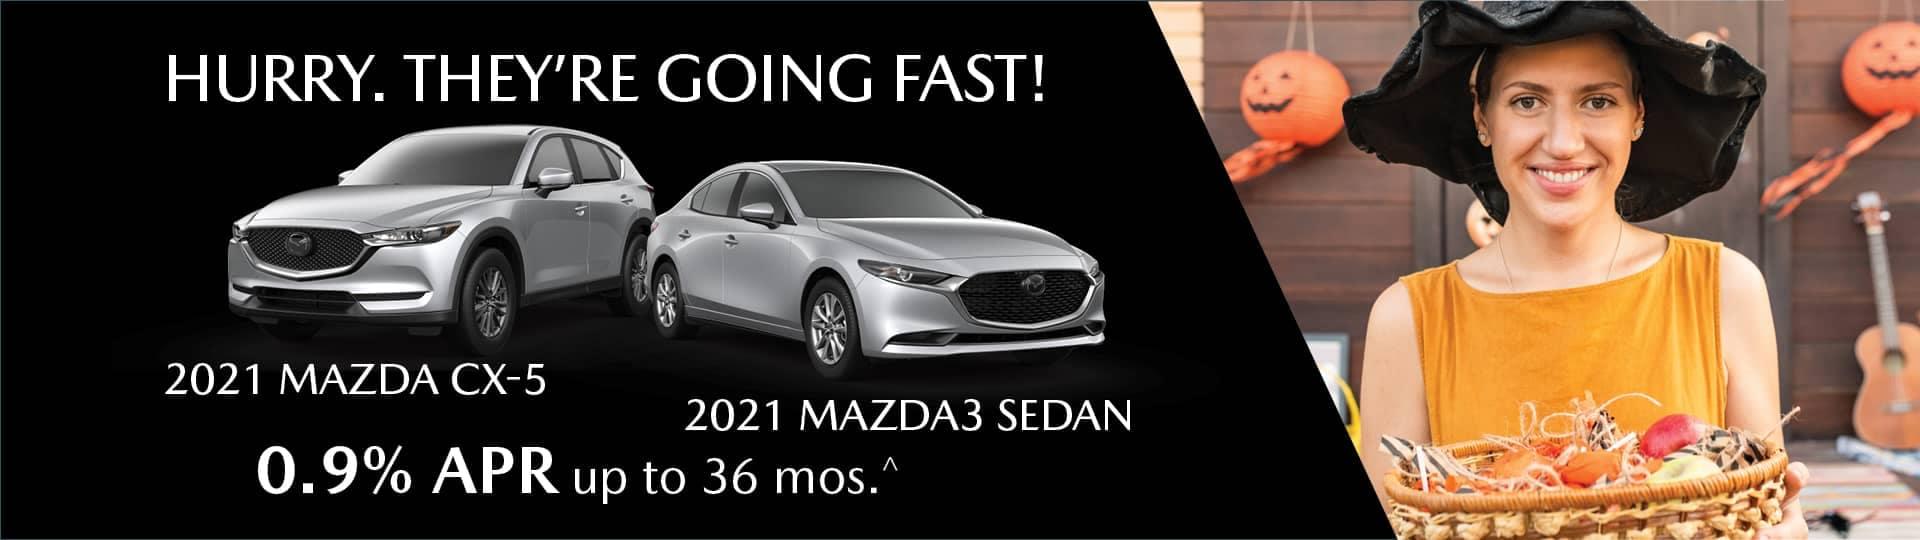 Hurry going fast mazda cx-5 and mazda3